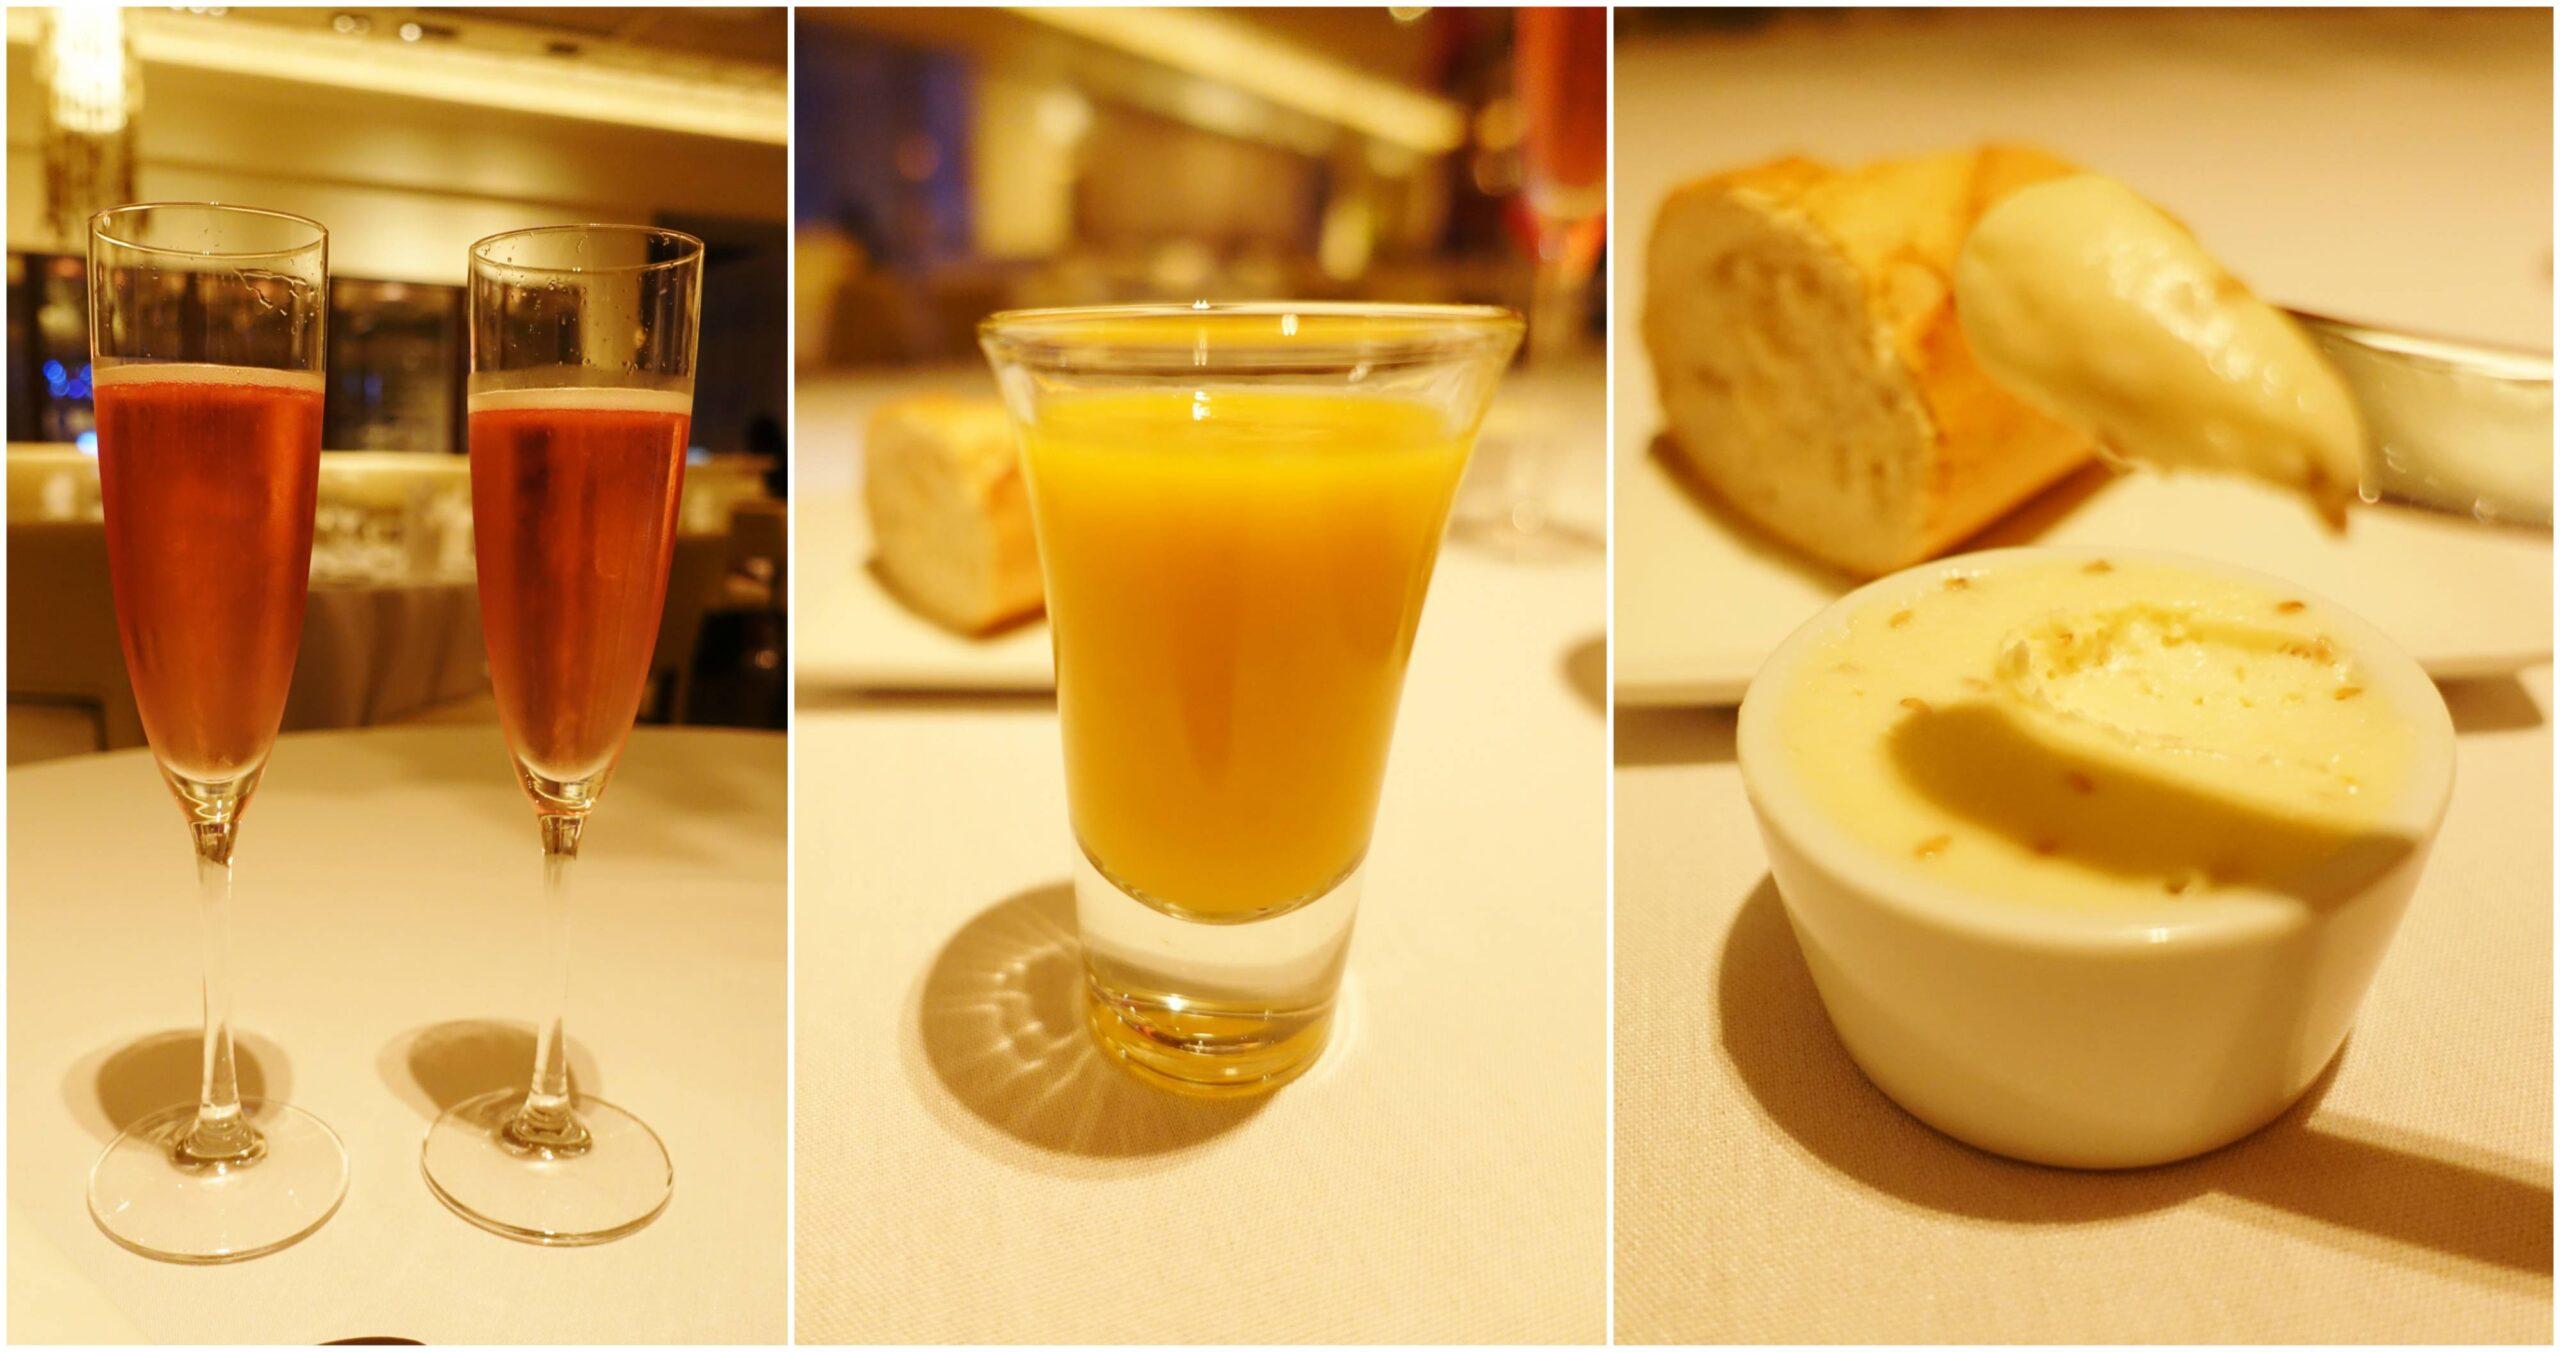 Champagne, Gazpacho, Bread & Butter